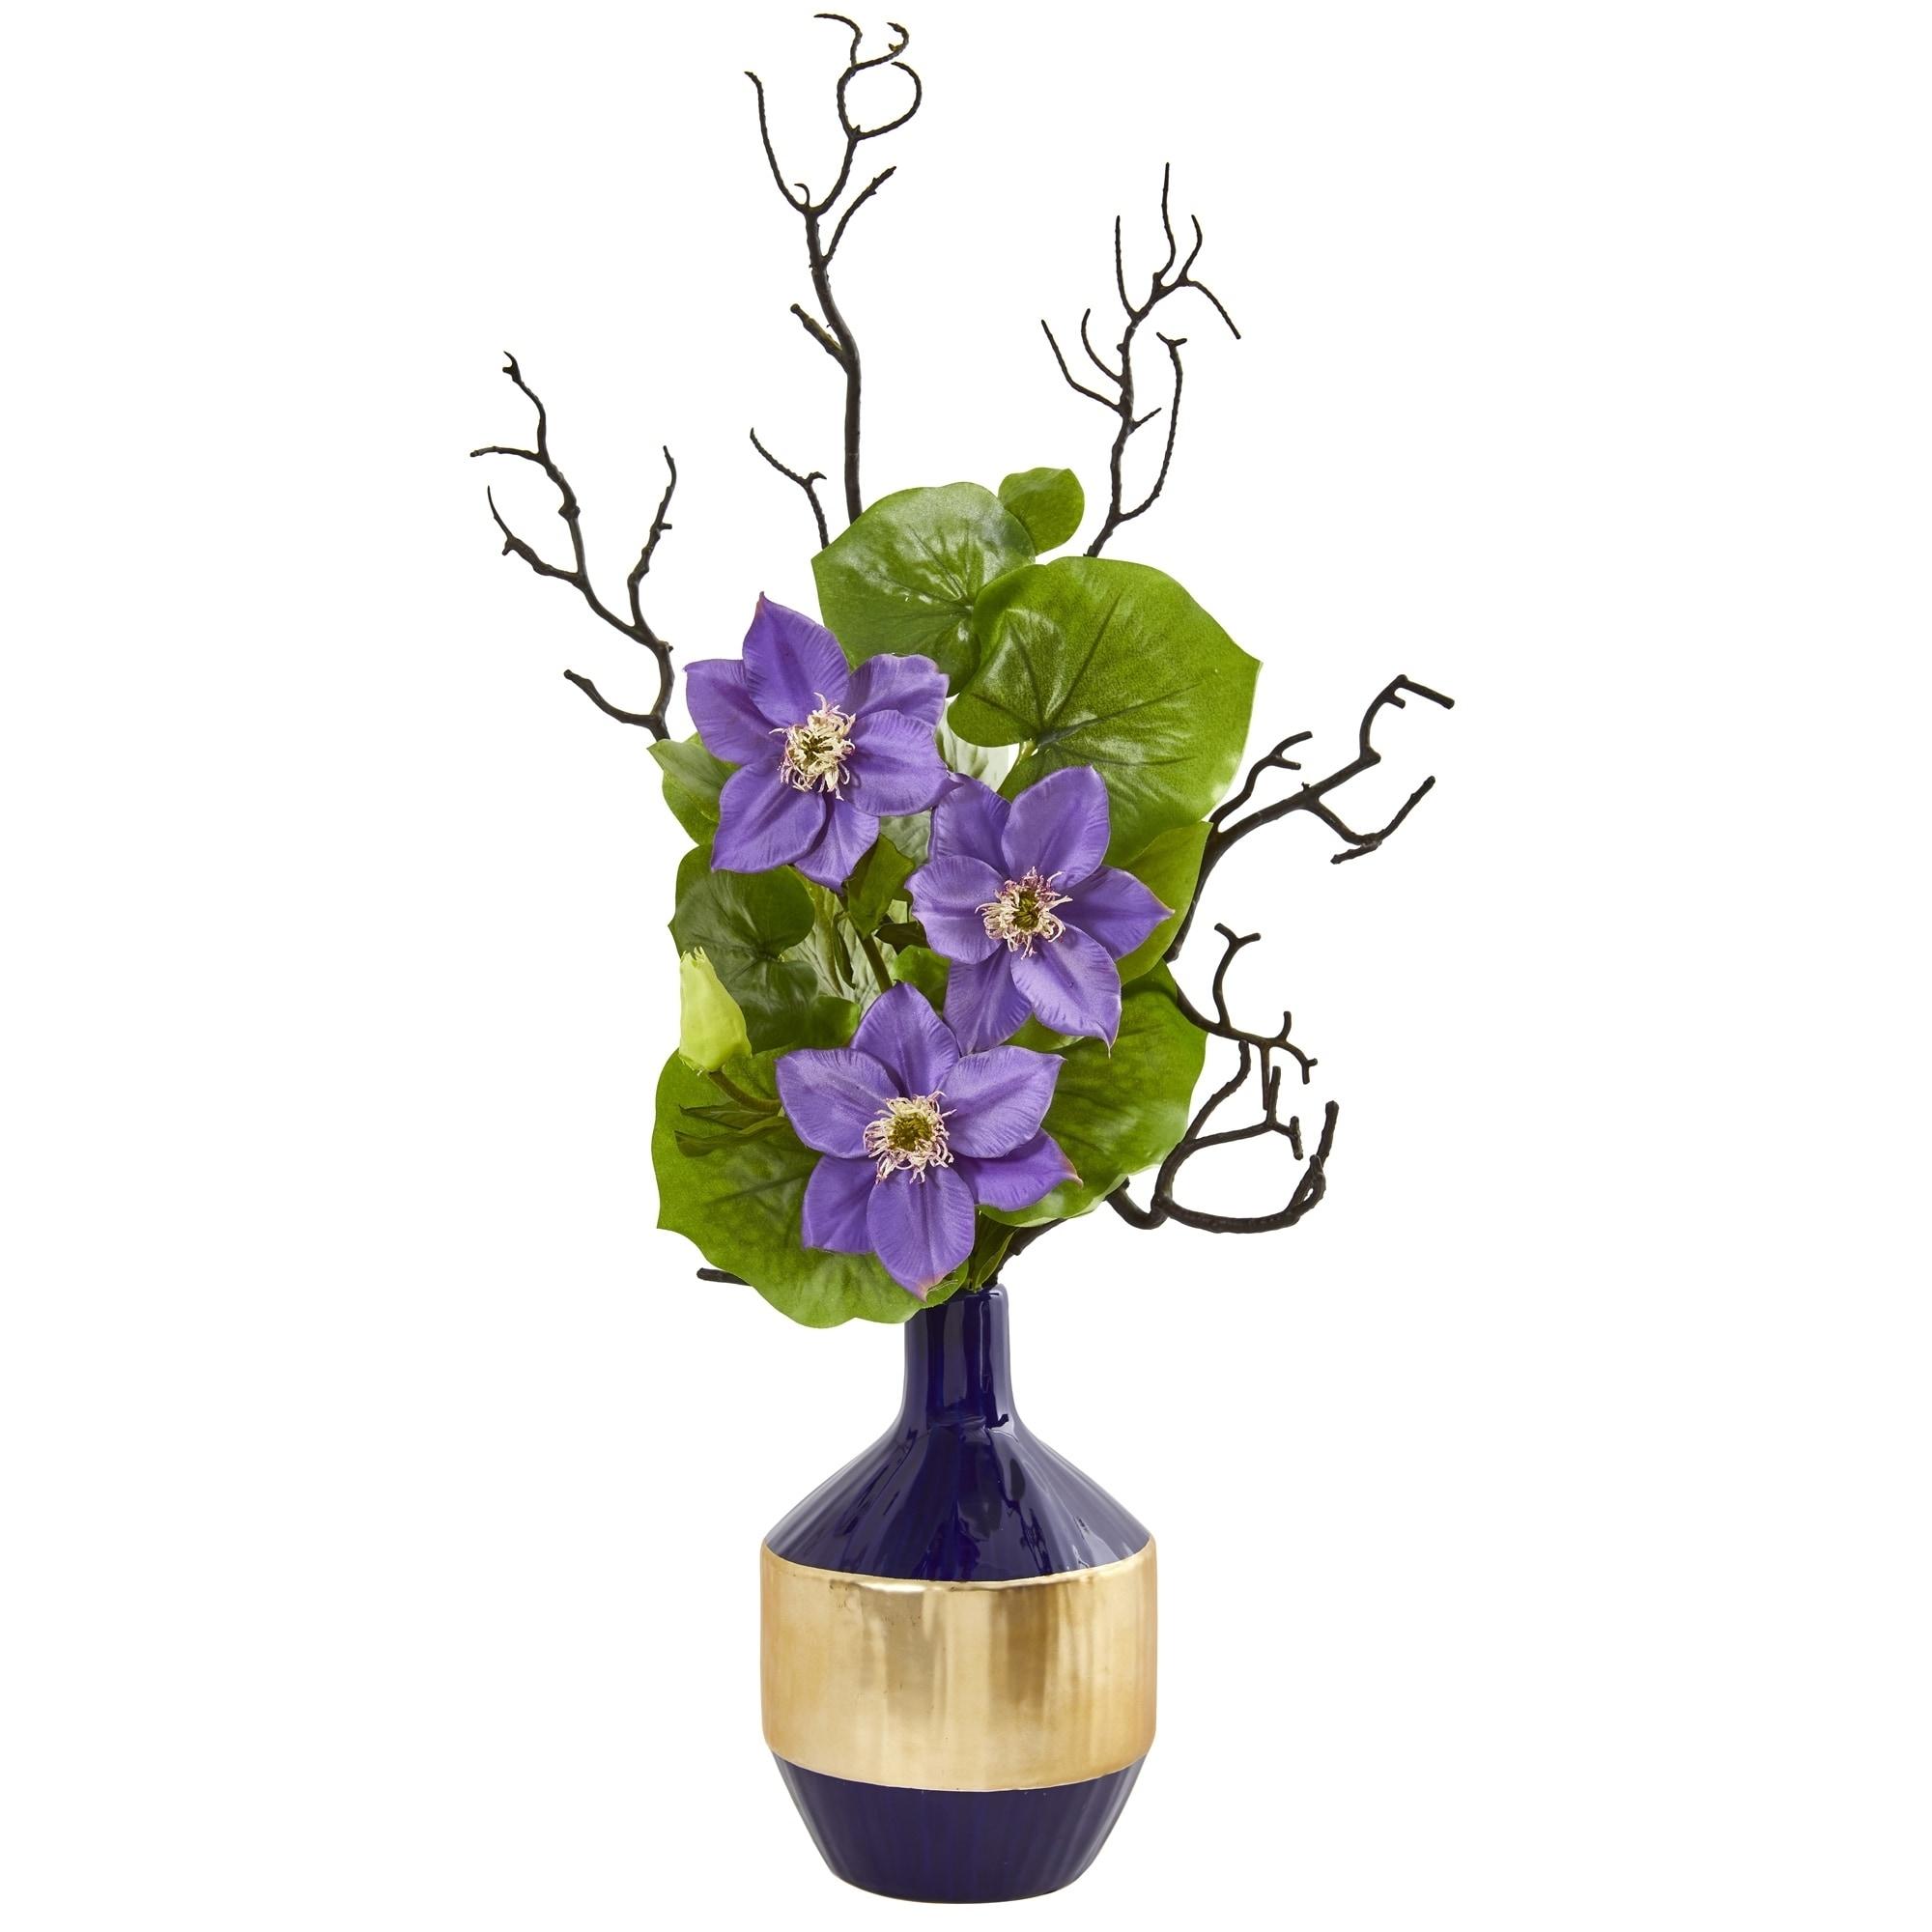 22 Anemone and Lotus Leaf Artificial Arrangement in Vase